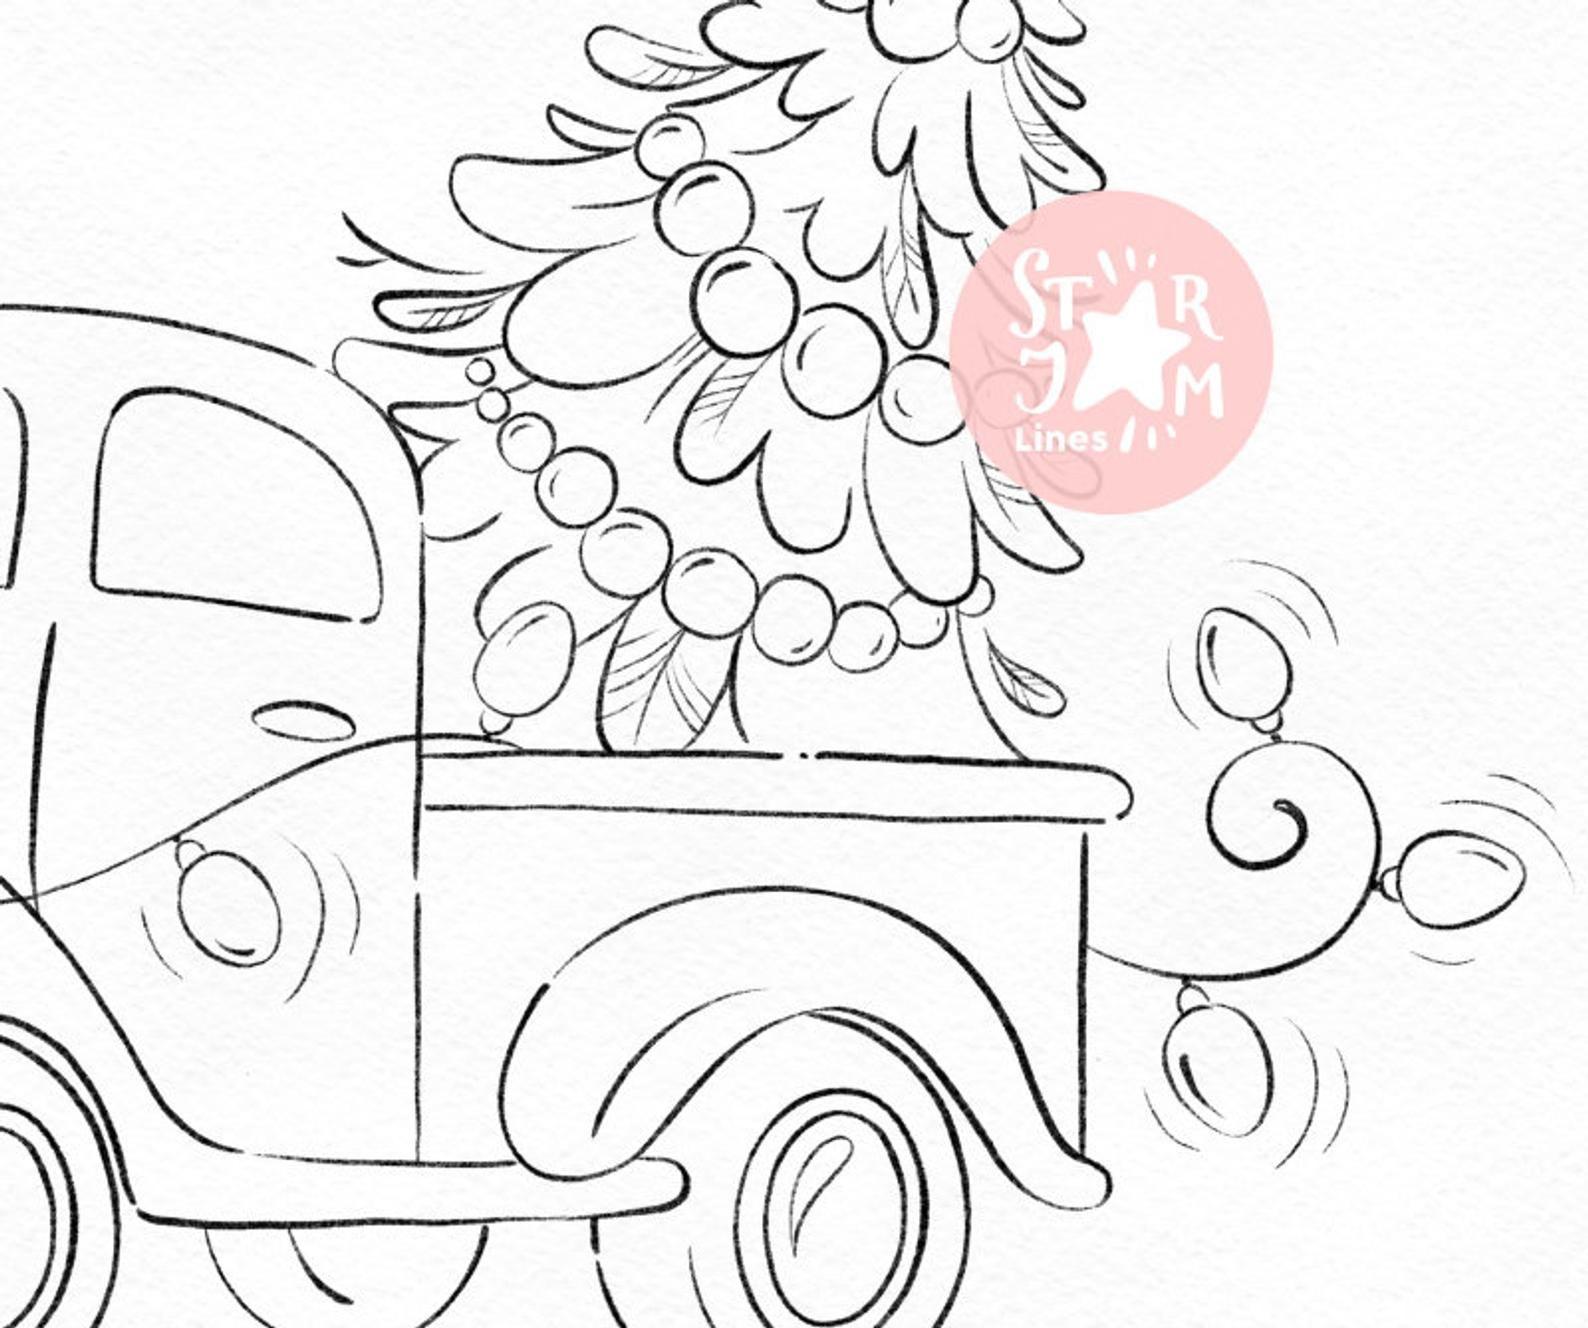 30 StarJam Line Drawings ideas  digi stamp, drawing artwork